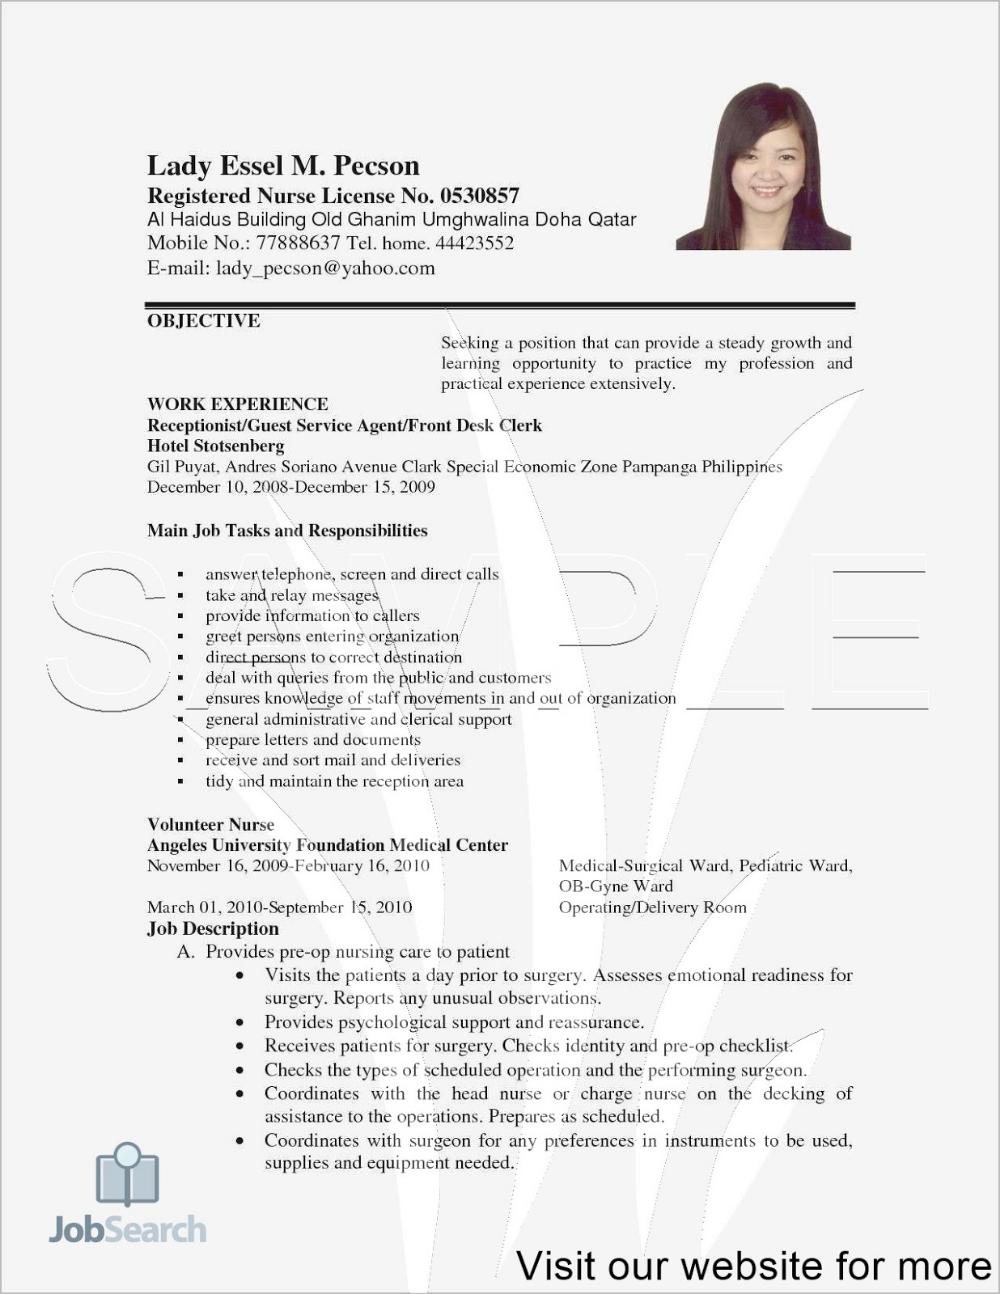 Resume Template High School Pdf